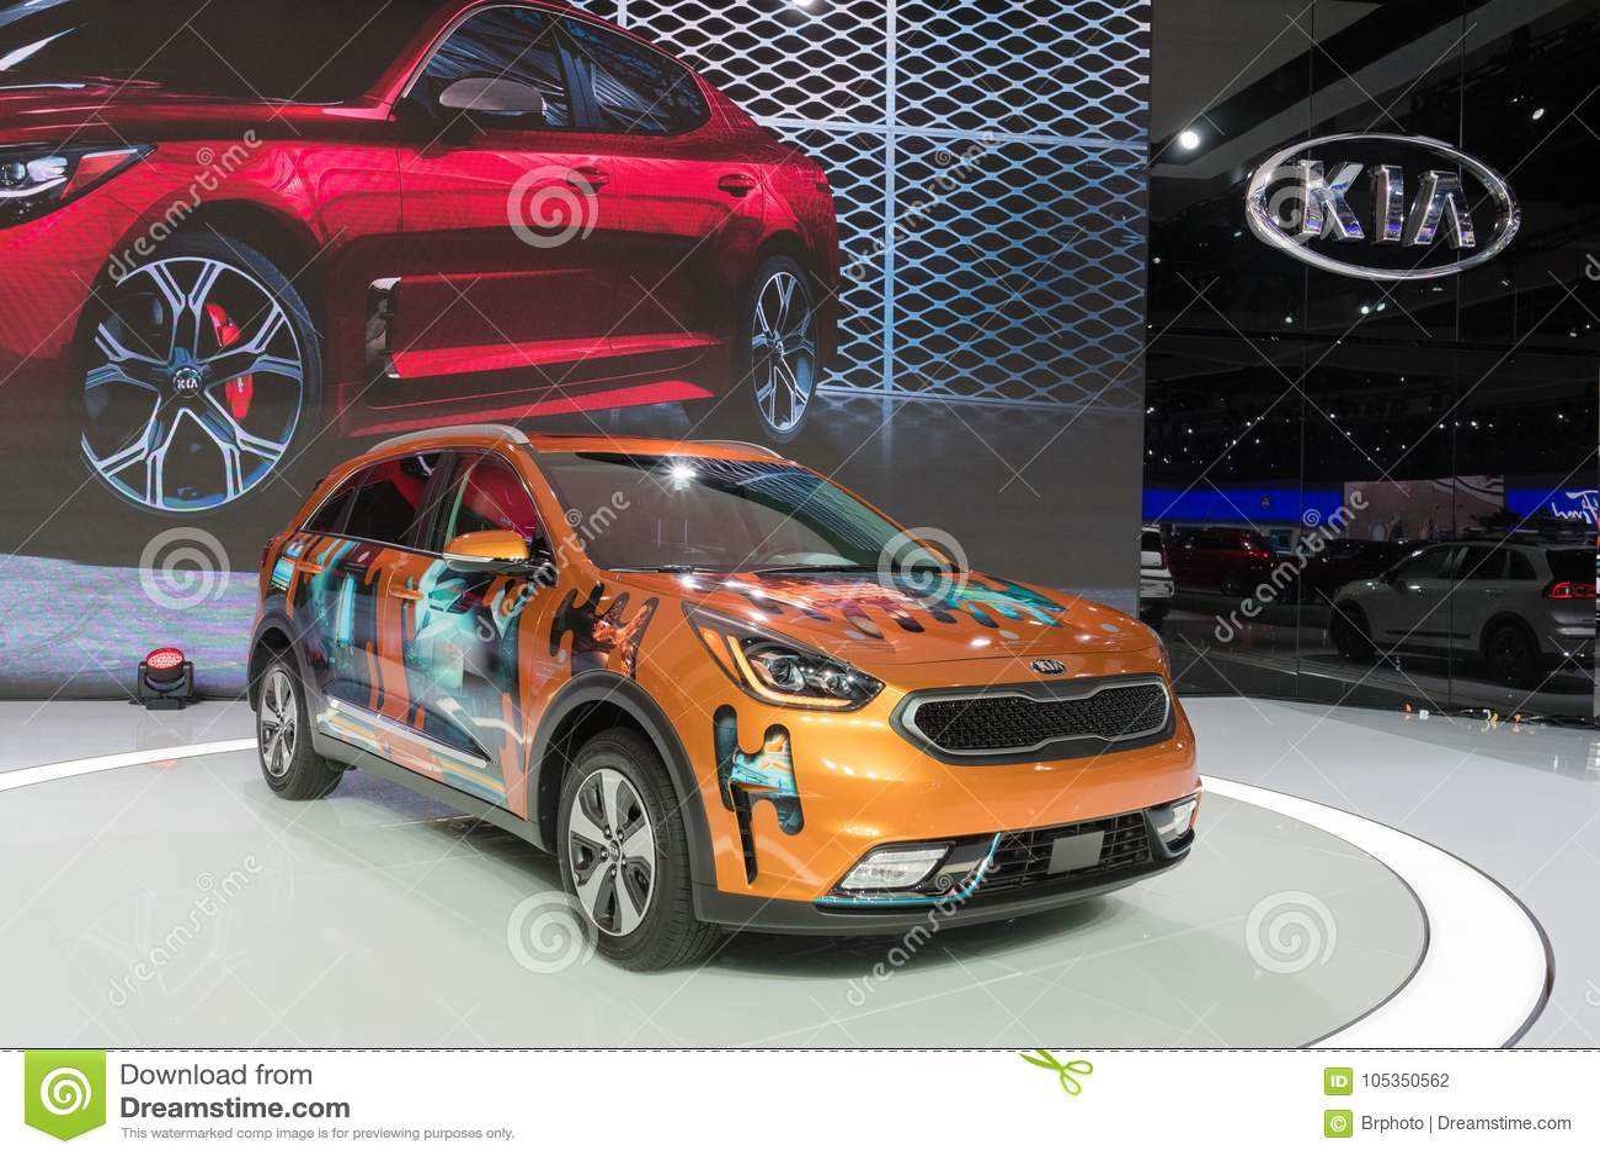 Kia Los Angeles >> Kia Niro Plug In Hybrid On Display During La Auto Show